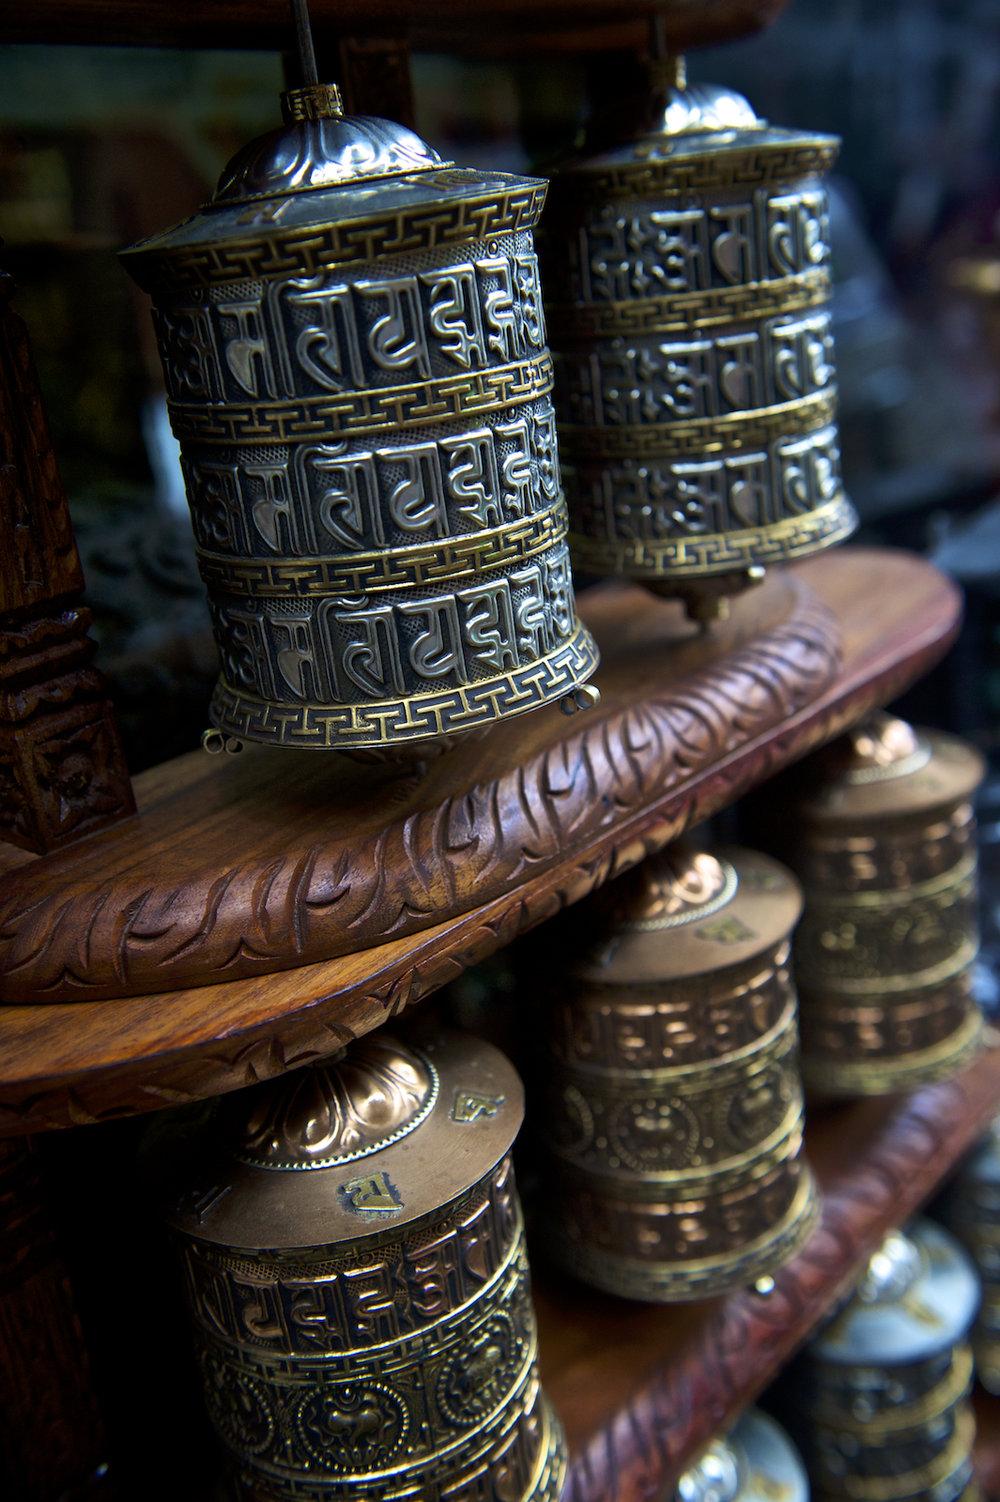 Buddhist prayer wheels in Kathmandu, Nepal. Image by New Orleans based travel photographer, Marc Pagani - marcpagani.com